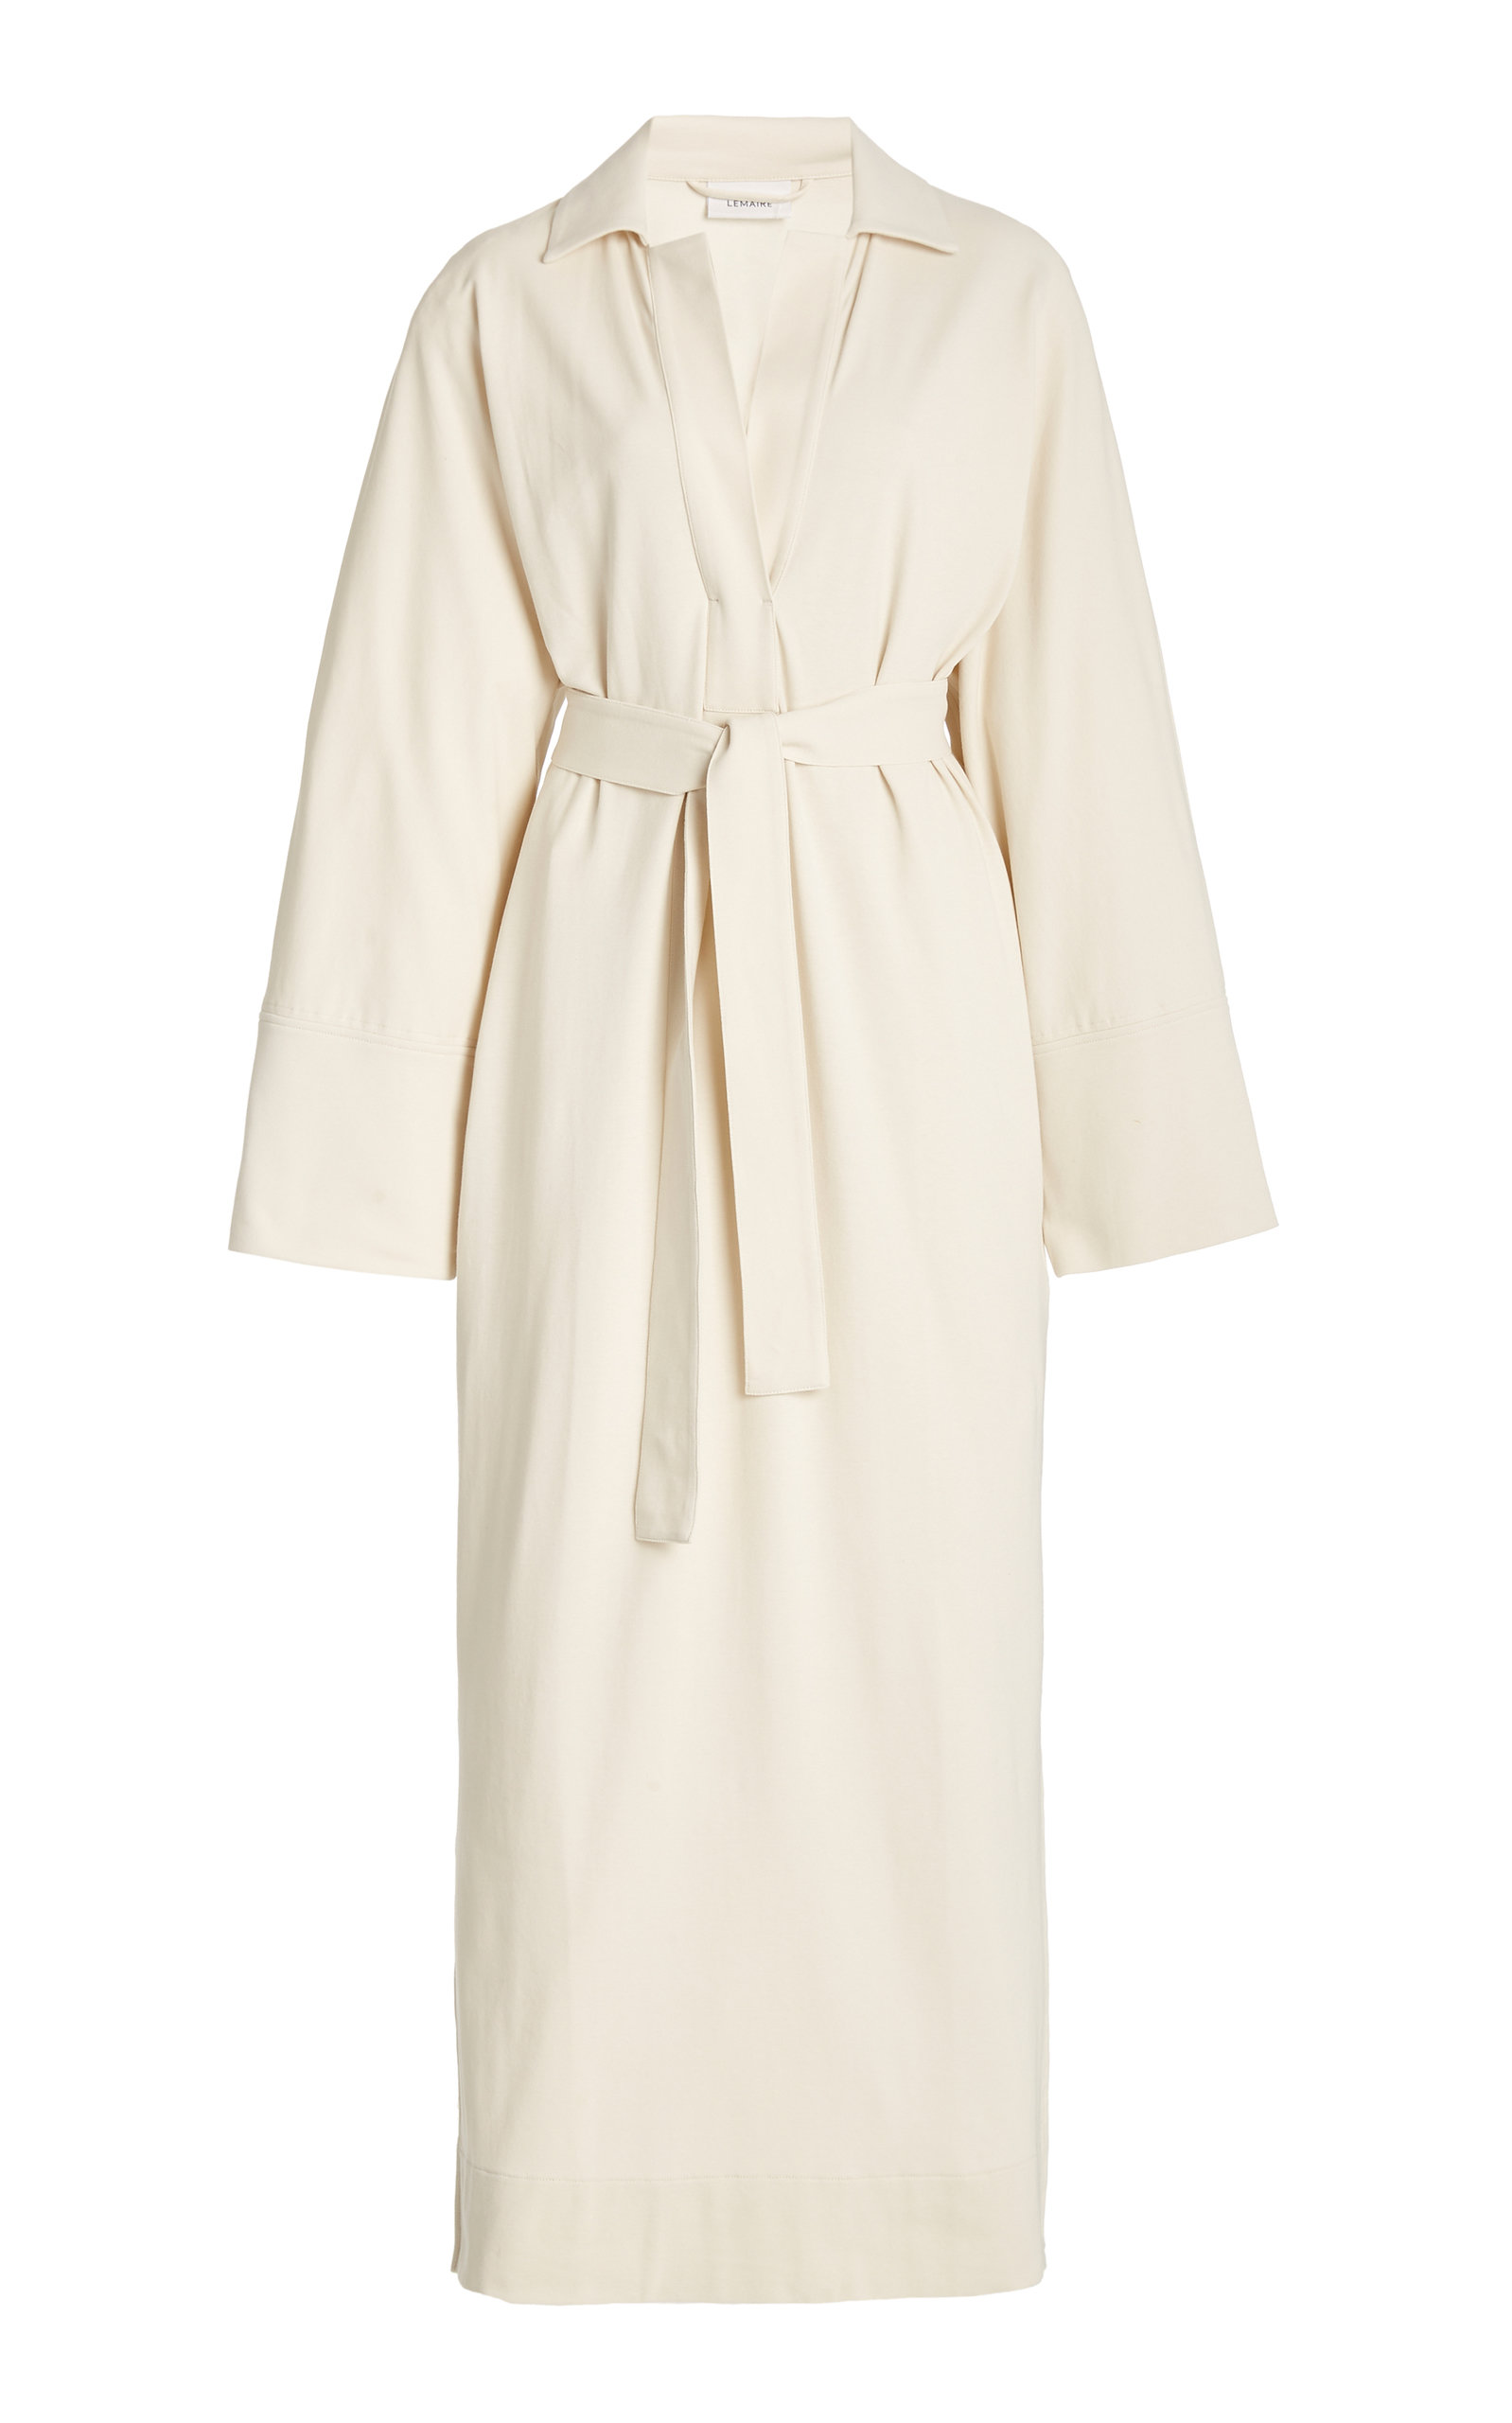 Buy Lemaire Wrap-Front Cotton Shirt Dress online, shop Lemaire at the best price